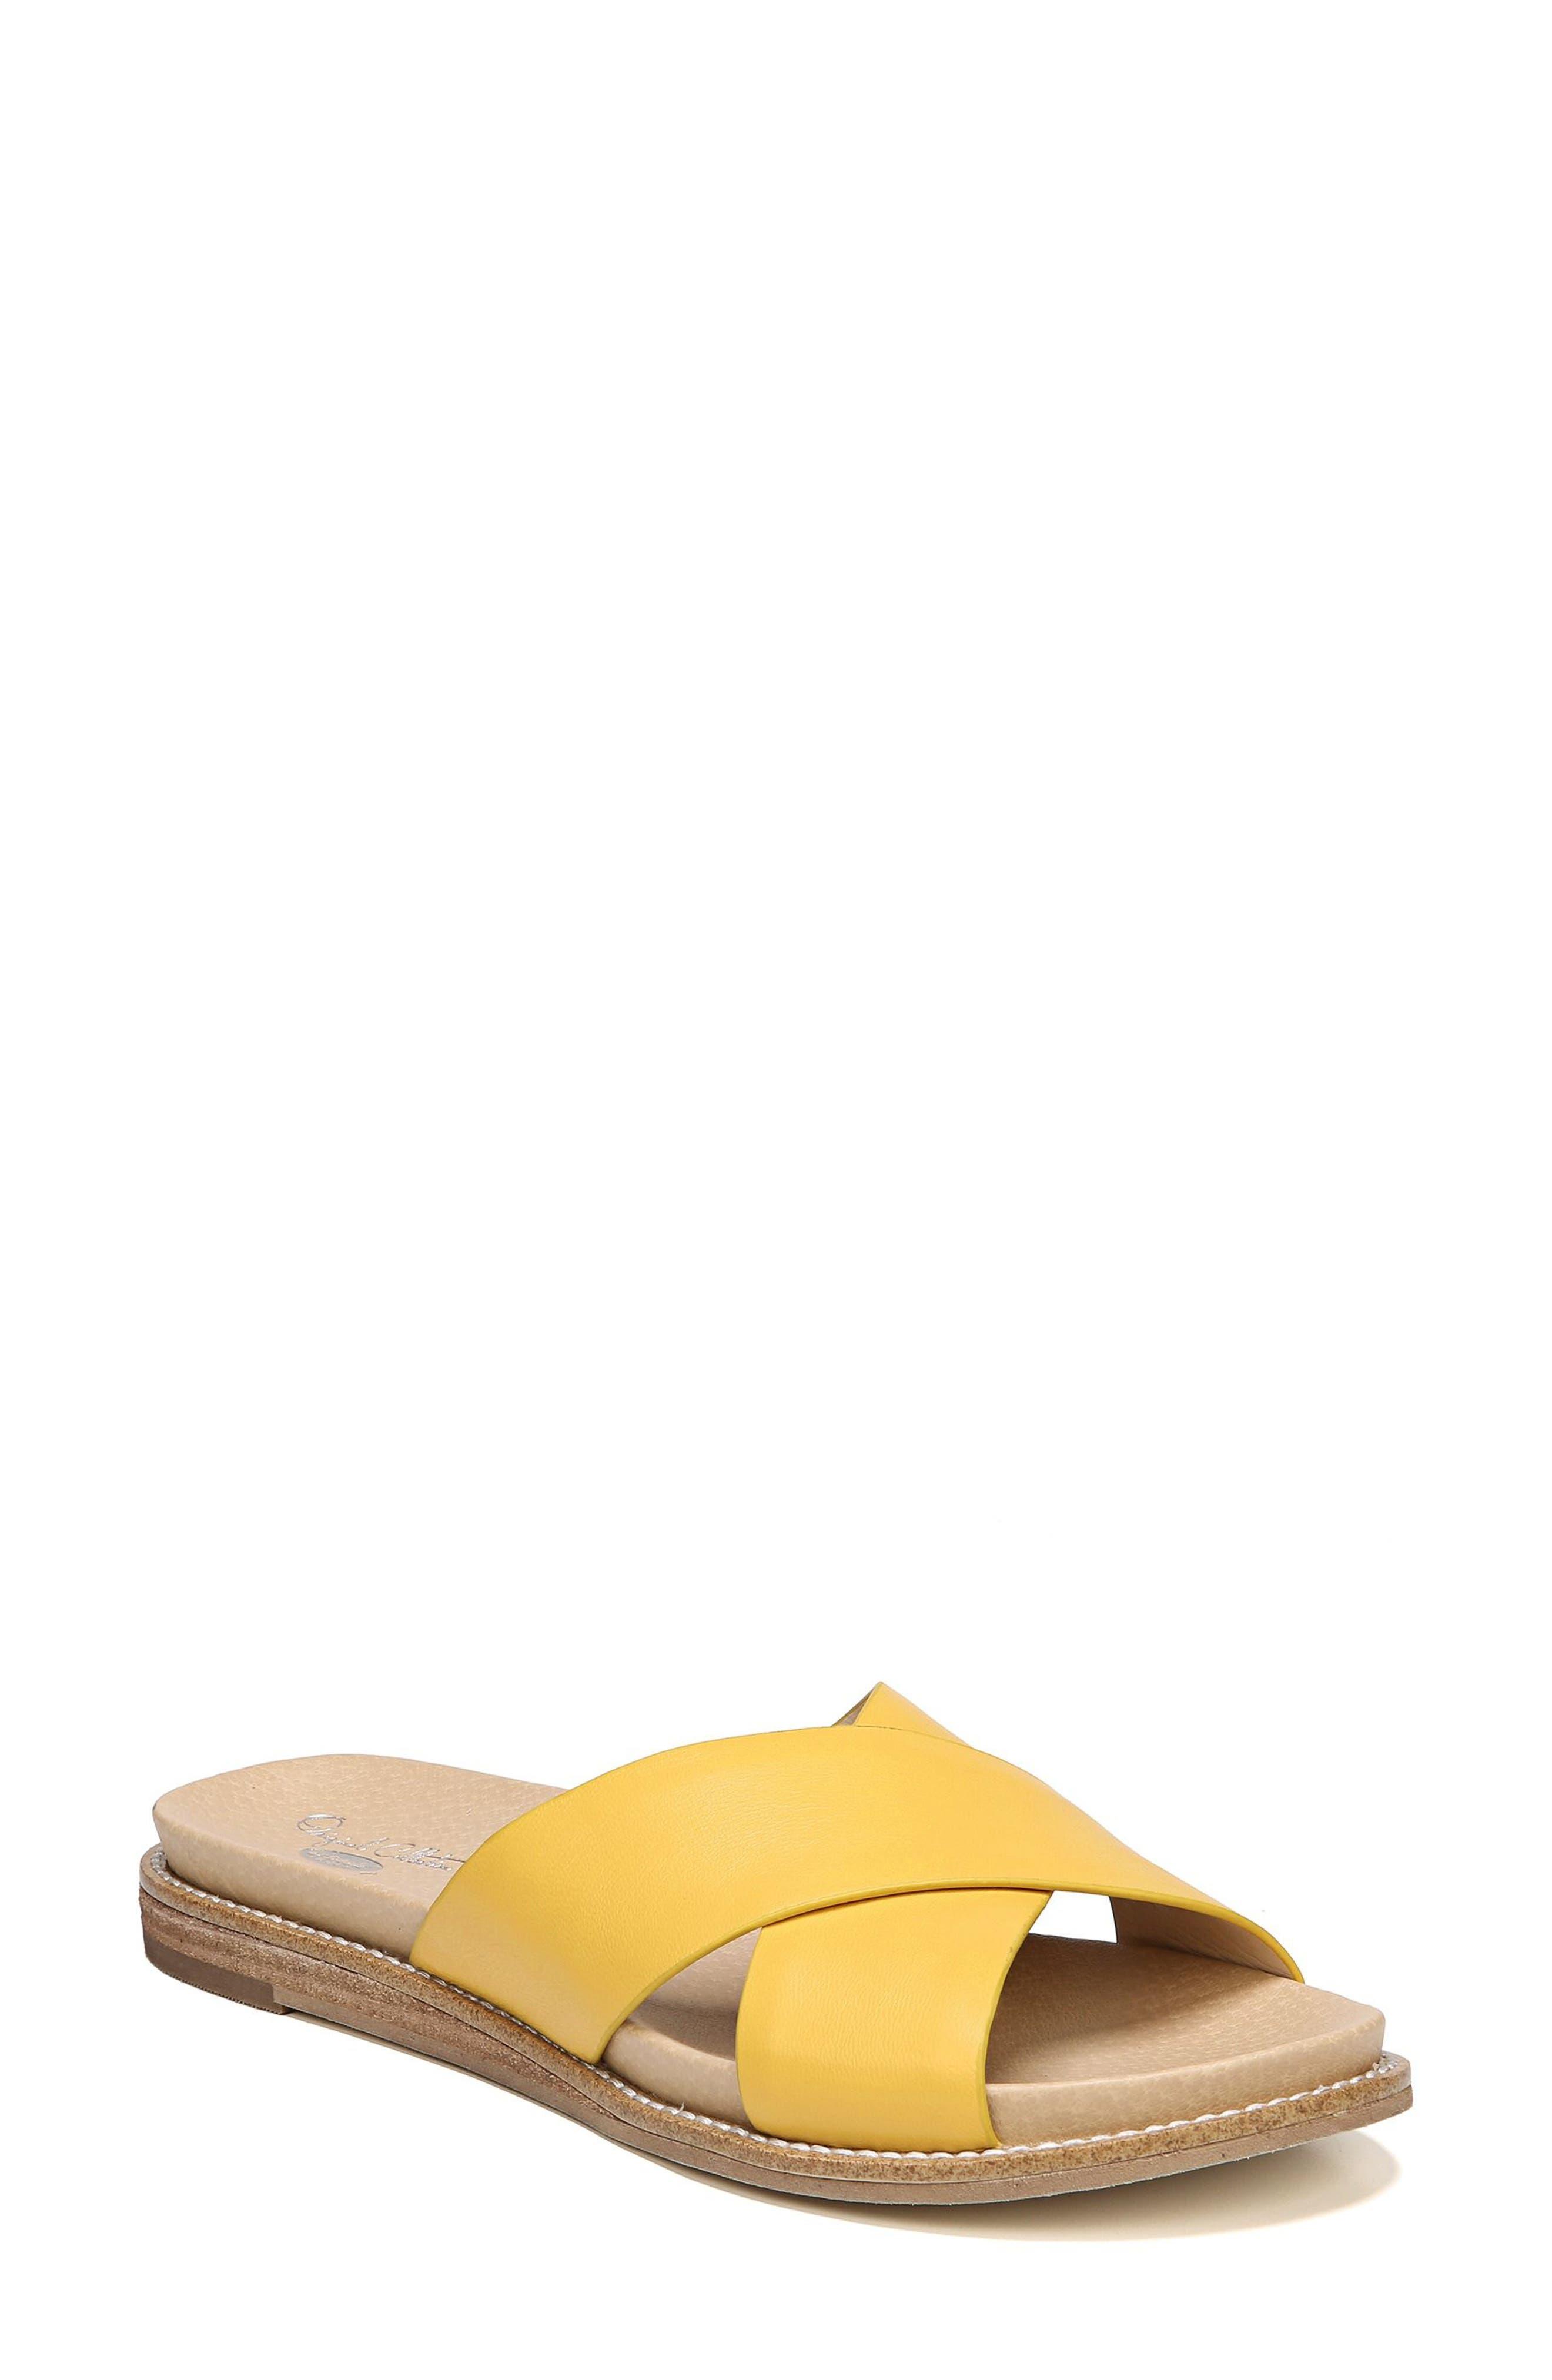 Dr. Scholl's Deco Slide Sandal (Women)